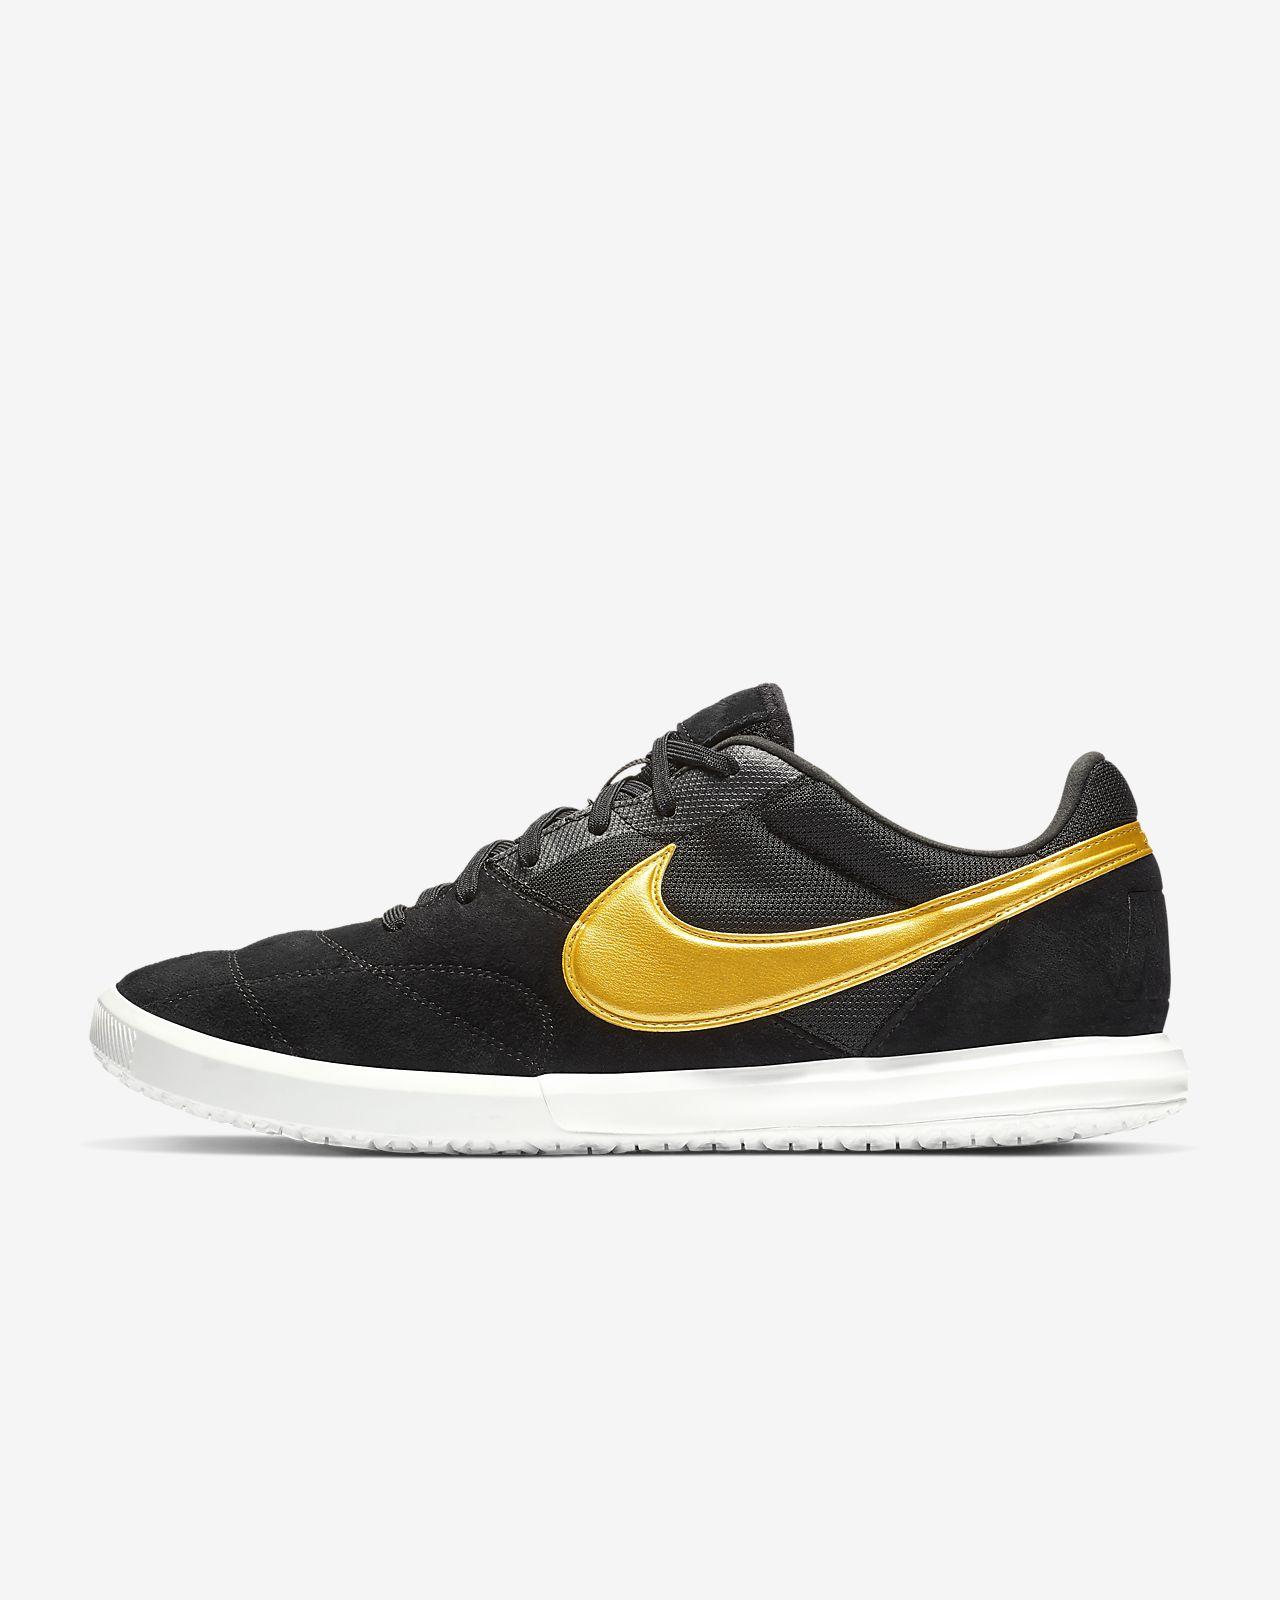 wholesale dealer 4b56b 5b287 ... Halowe buty piłkarskie Nike Tiempo Premier II Sala